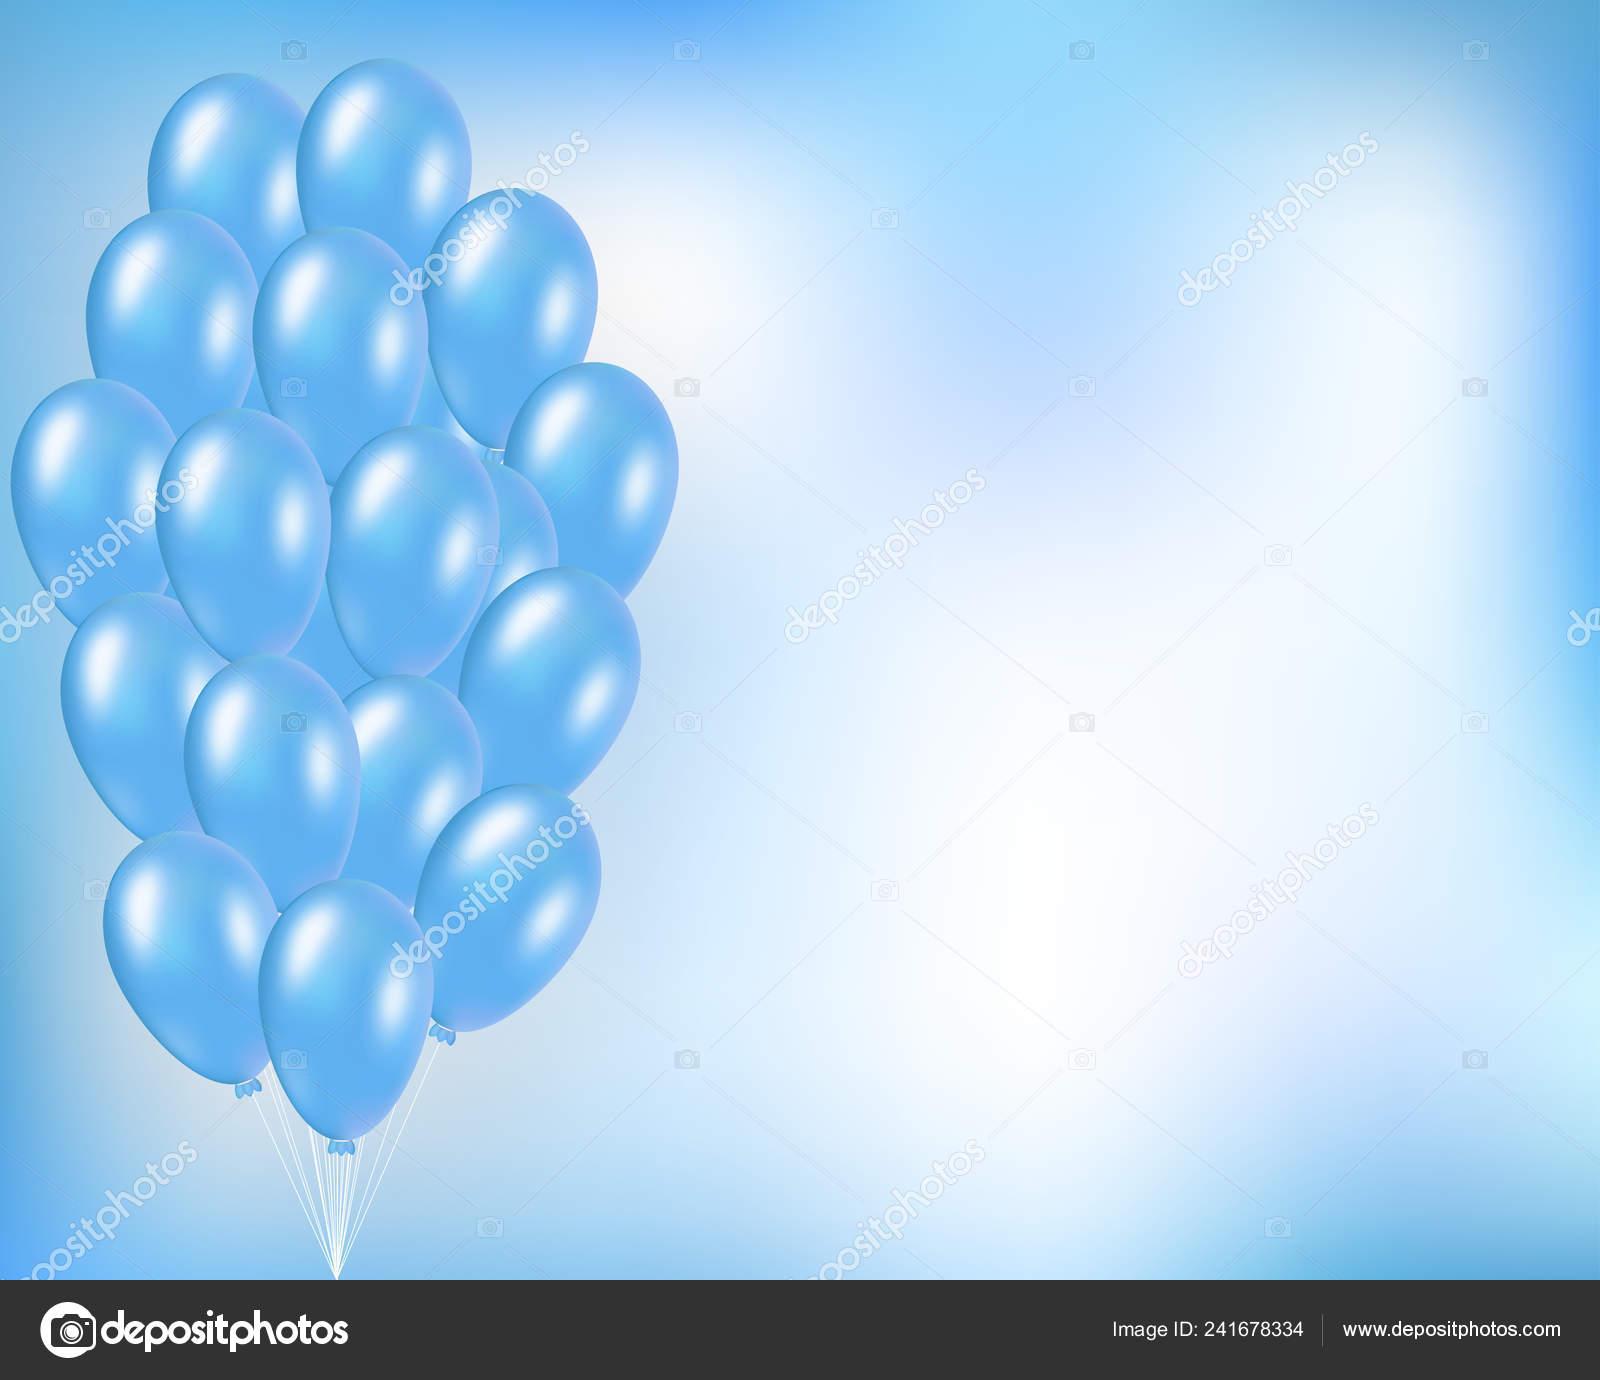 festive vector background blue balloons bunch elegant concept party birthday vector image by c designertimi vector stock 241678334